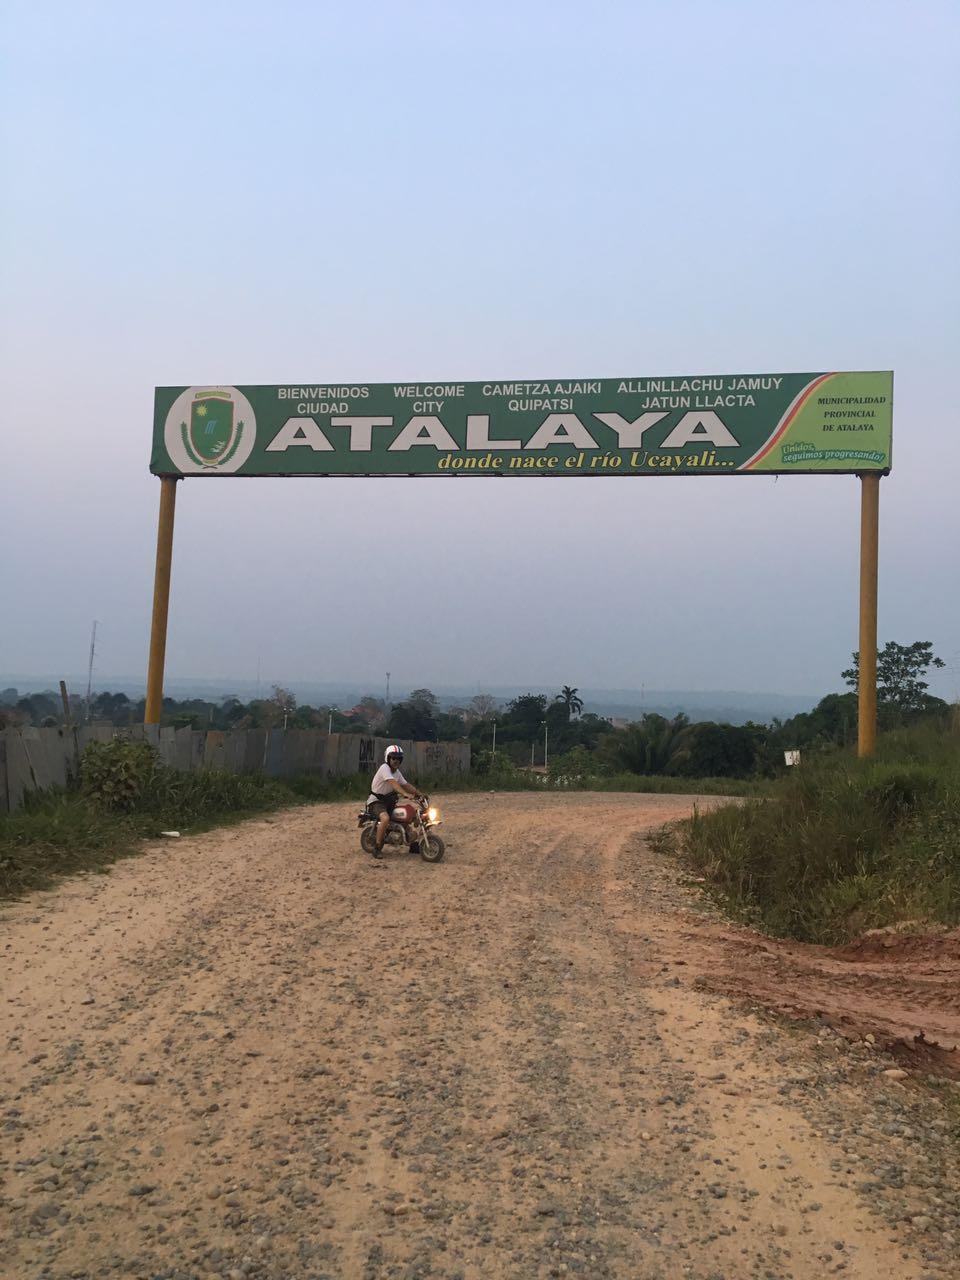 Mr Joolz finally rides a monkey bike into Atalaya under his own steam